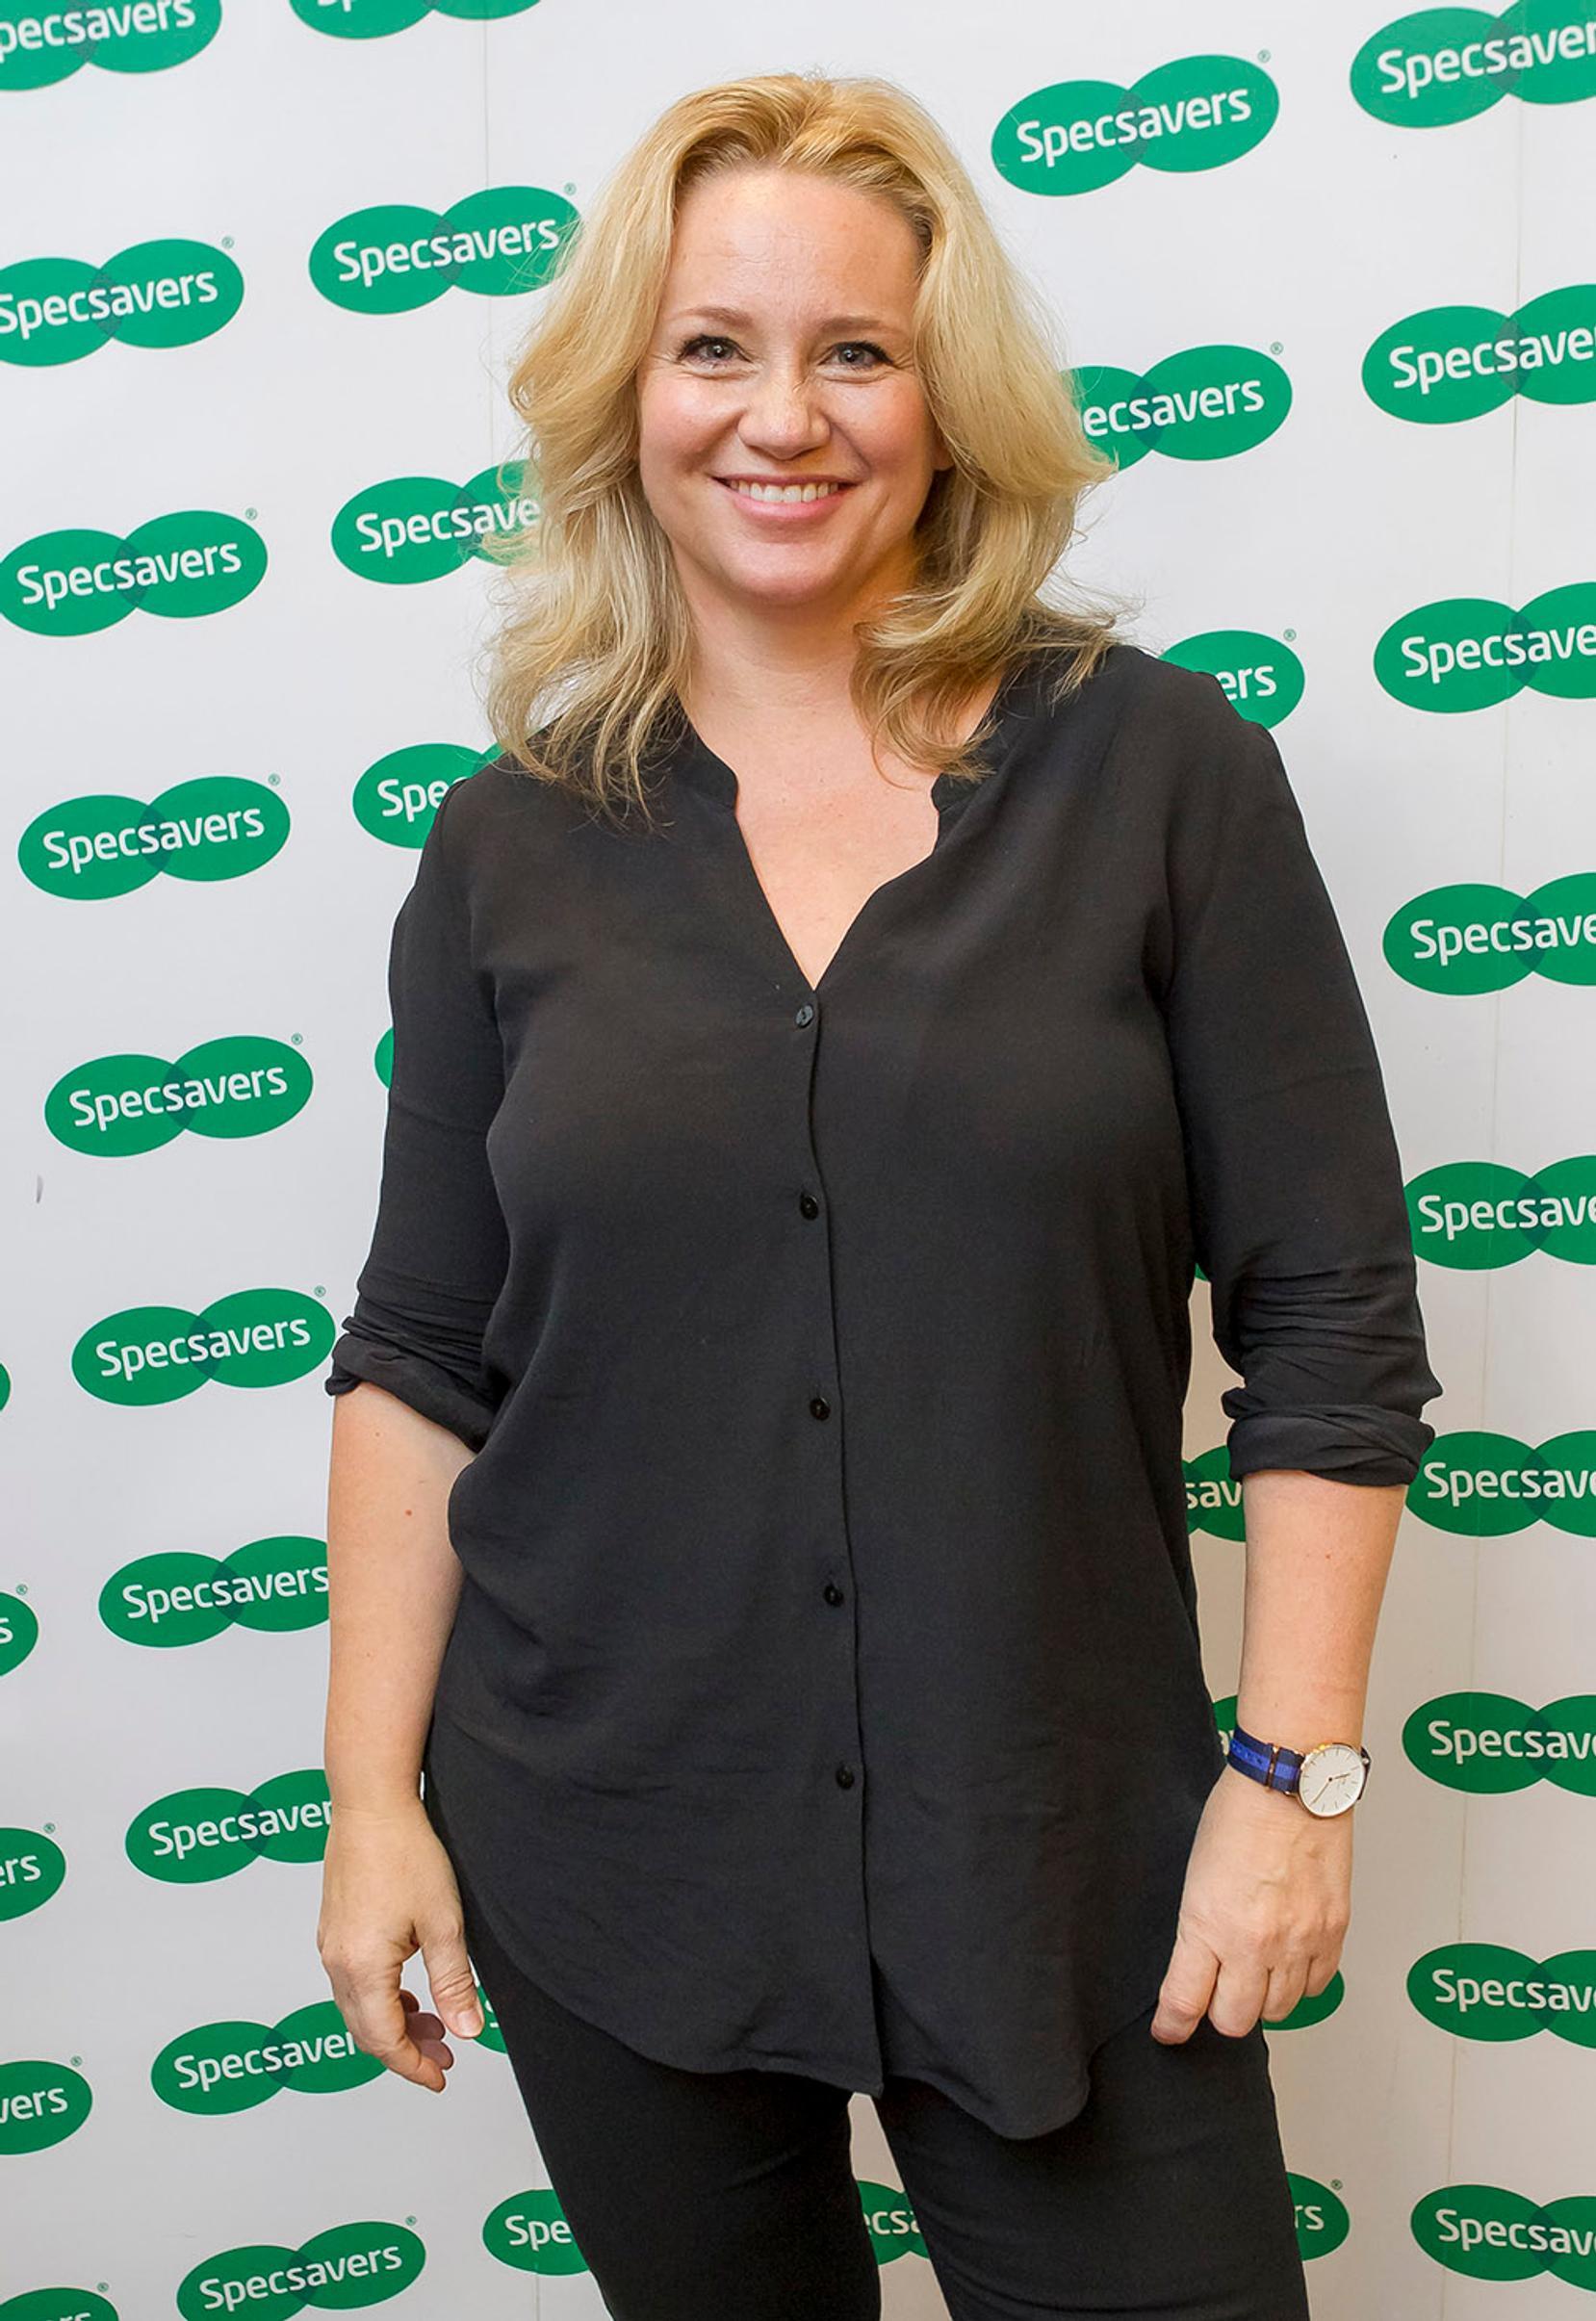 Maria Auvinen